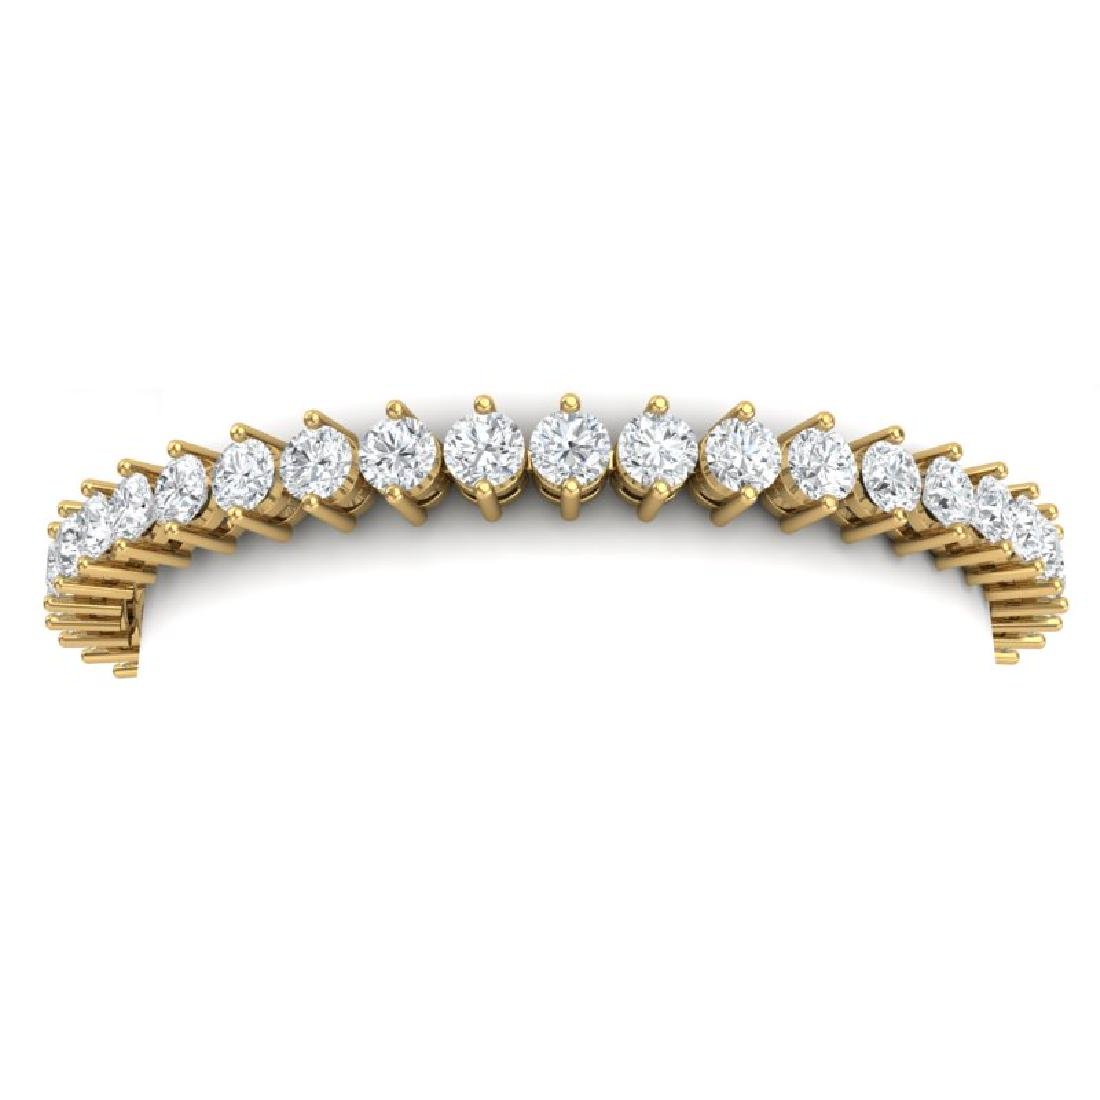 13 CTW Certified VS/SI Diamond Bracelet 18K Yellow Gold - 2